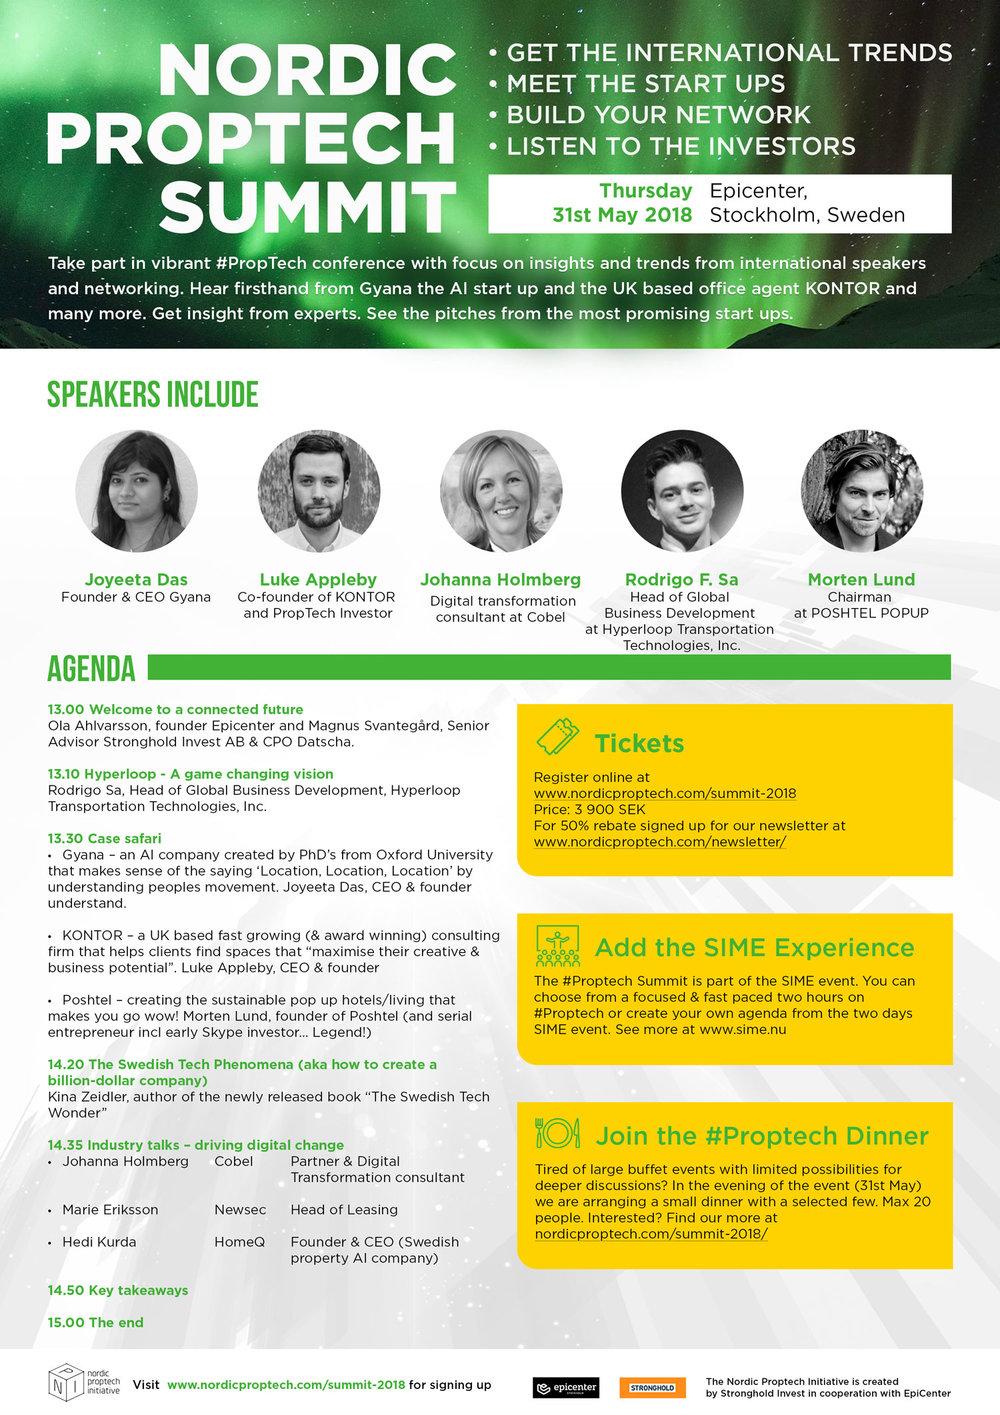 Nordic-PropTech_Summit-2018_Agenda.jpg